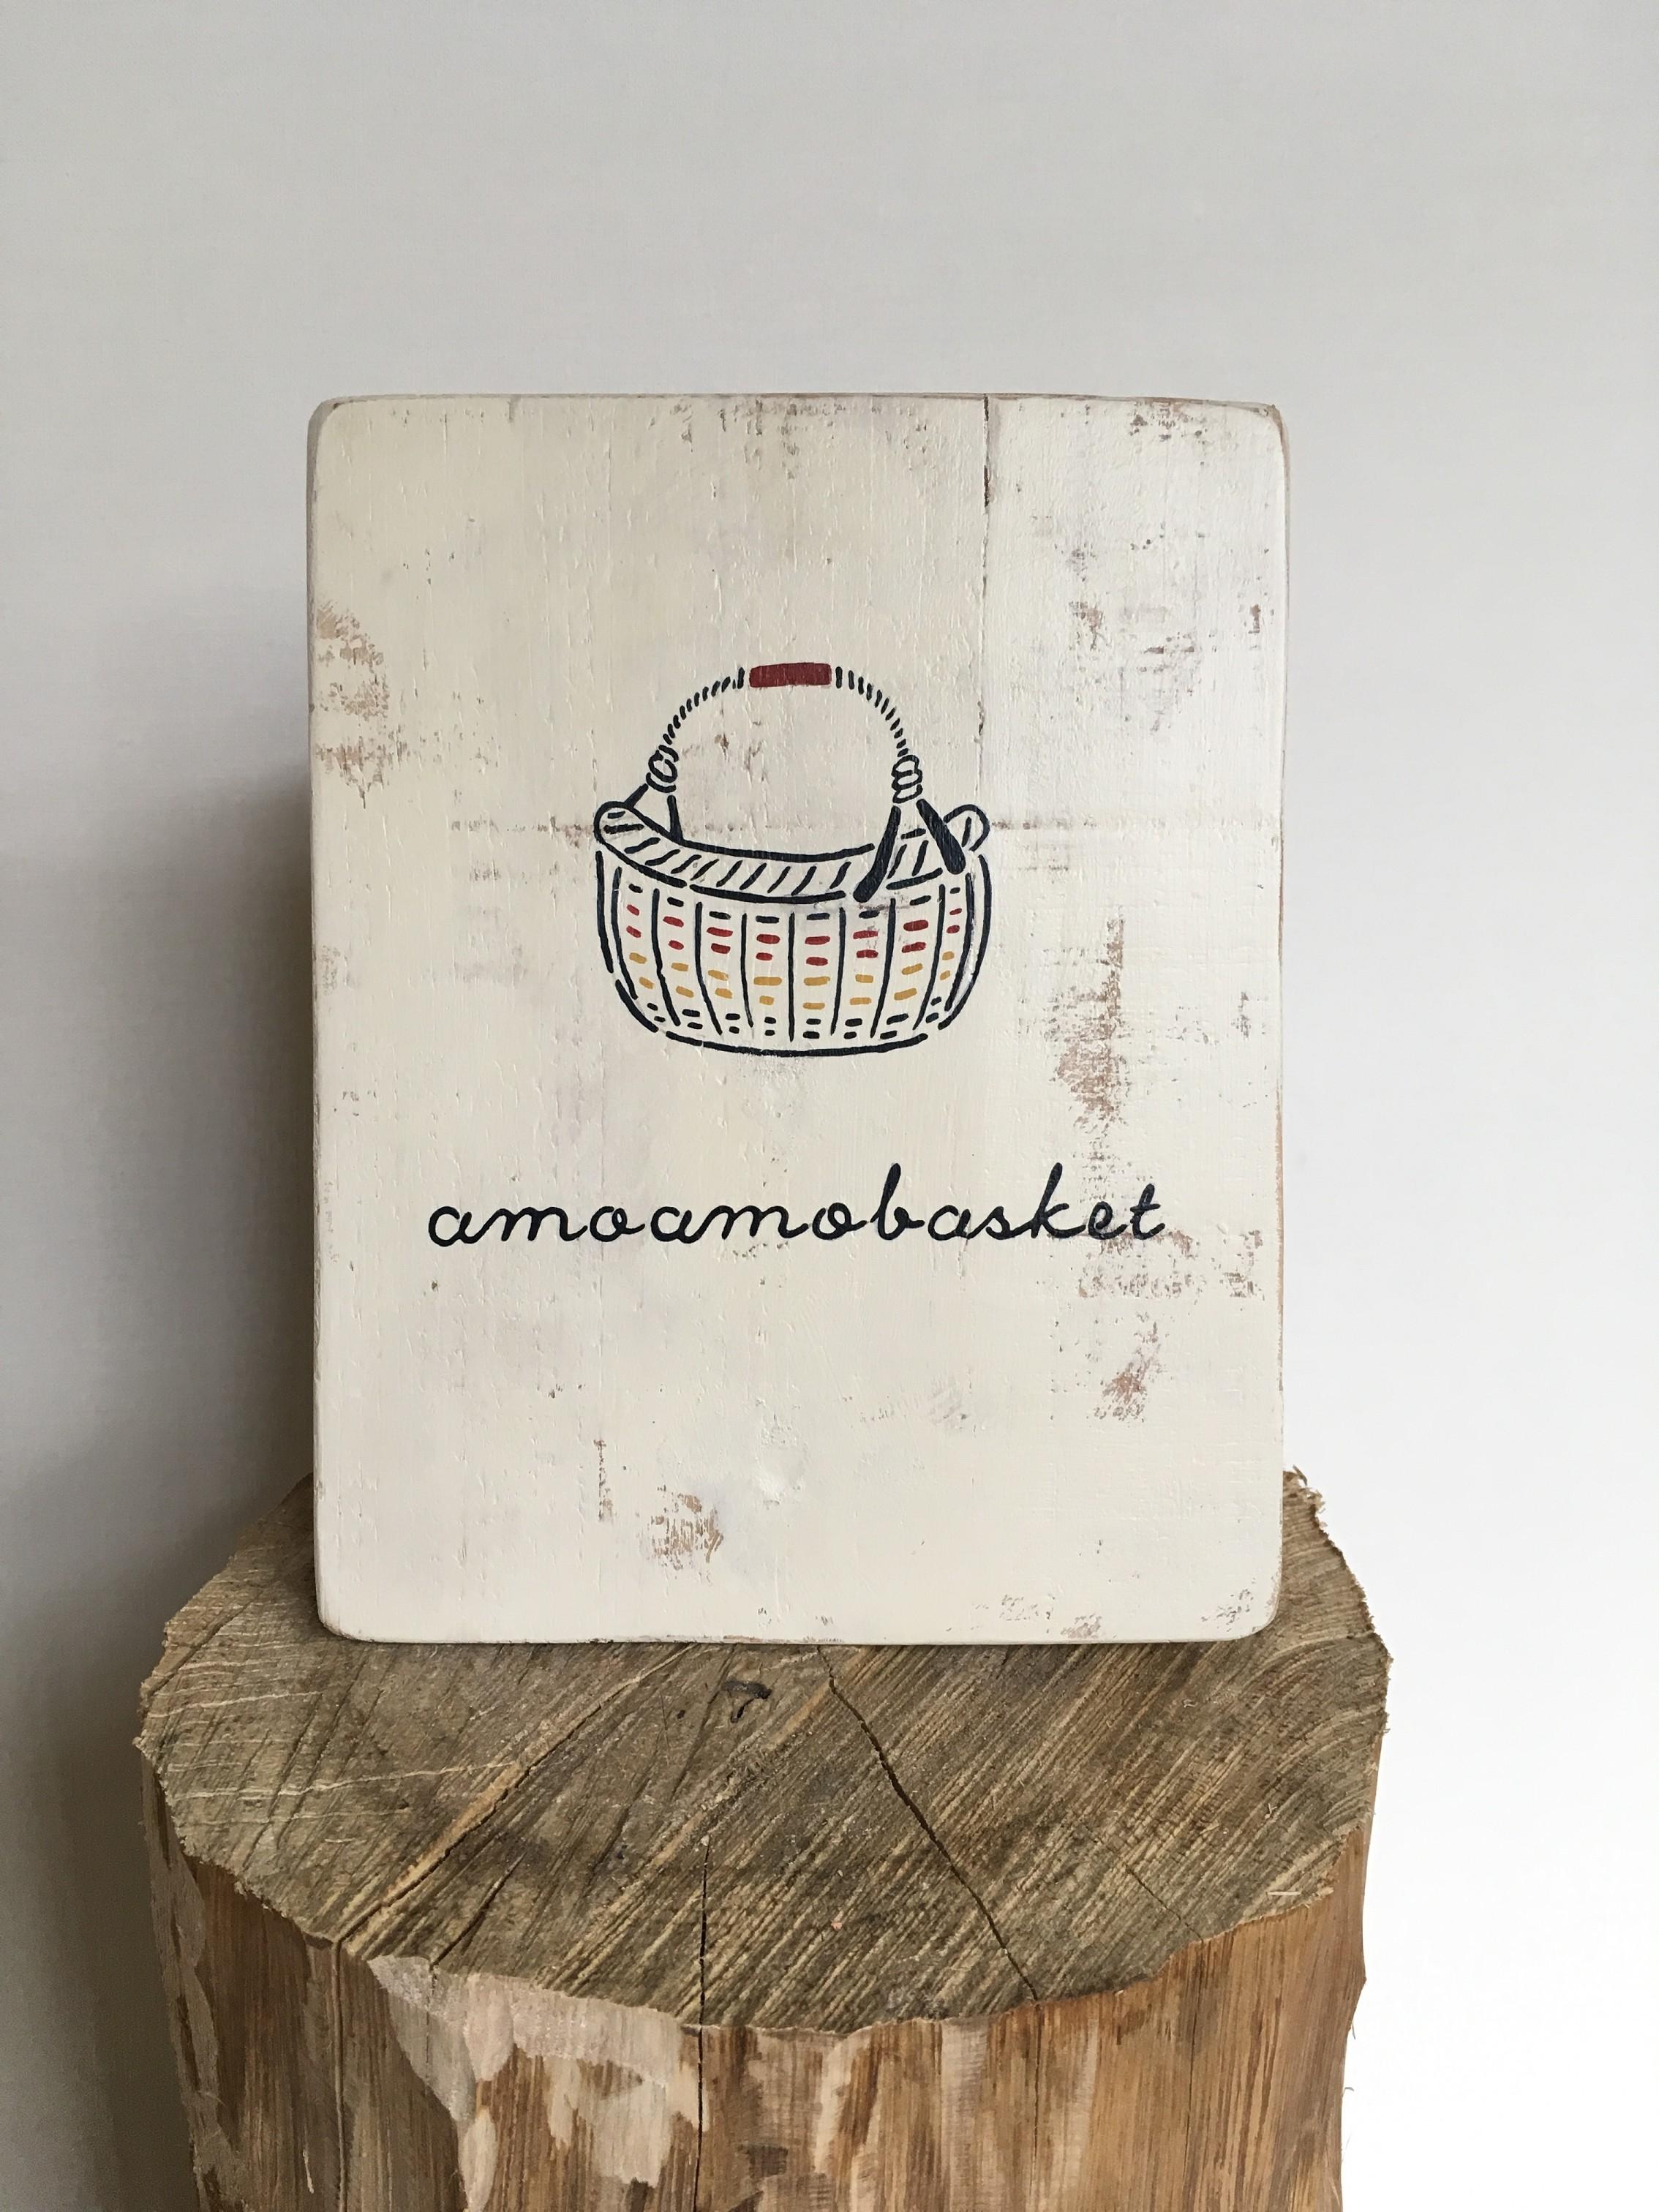 amoamobasket 出店用サイン